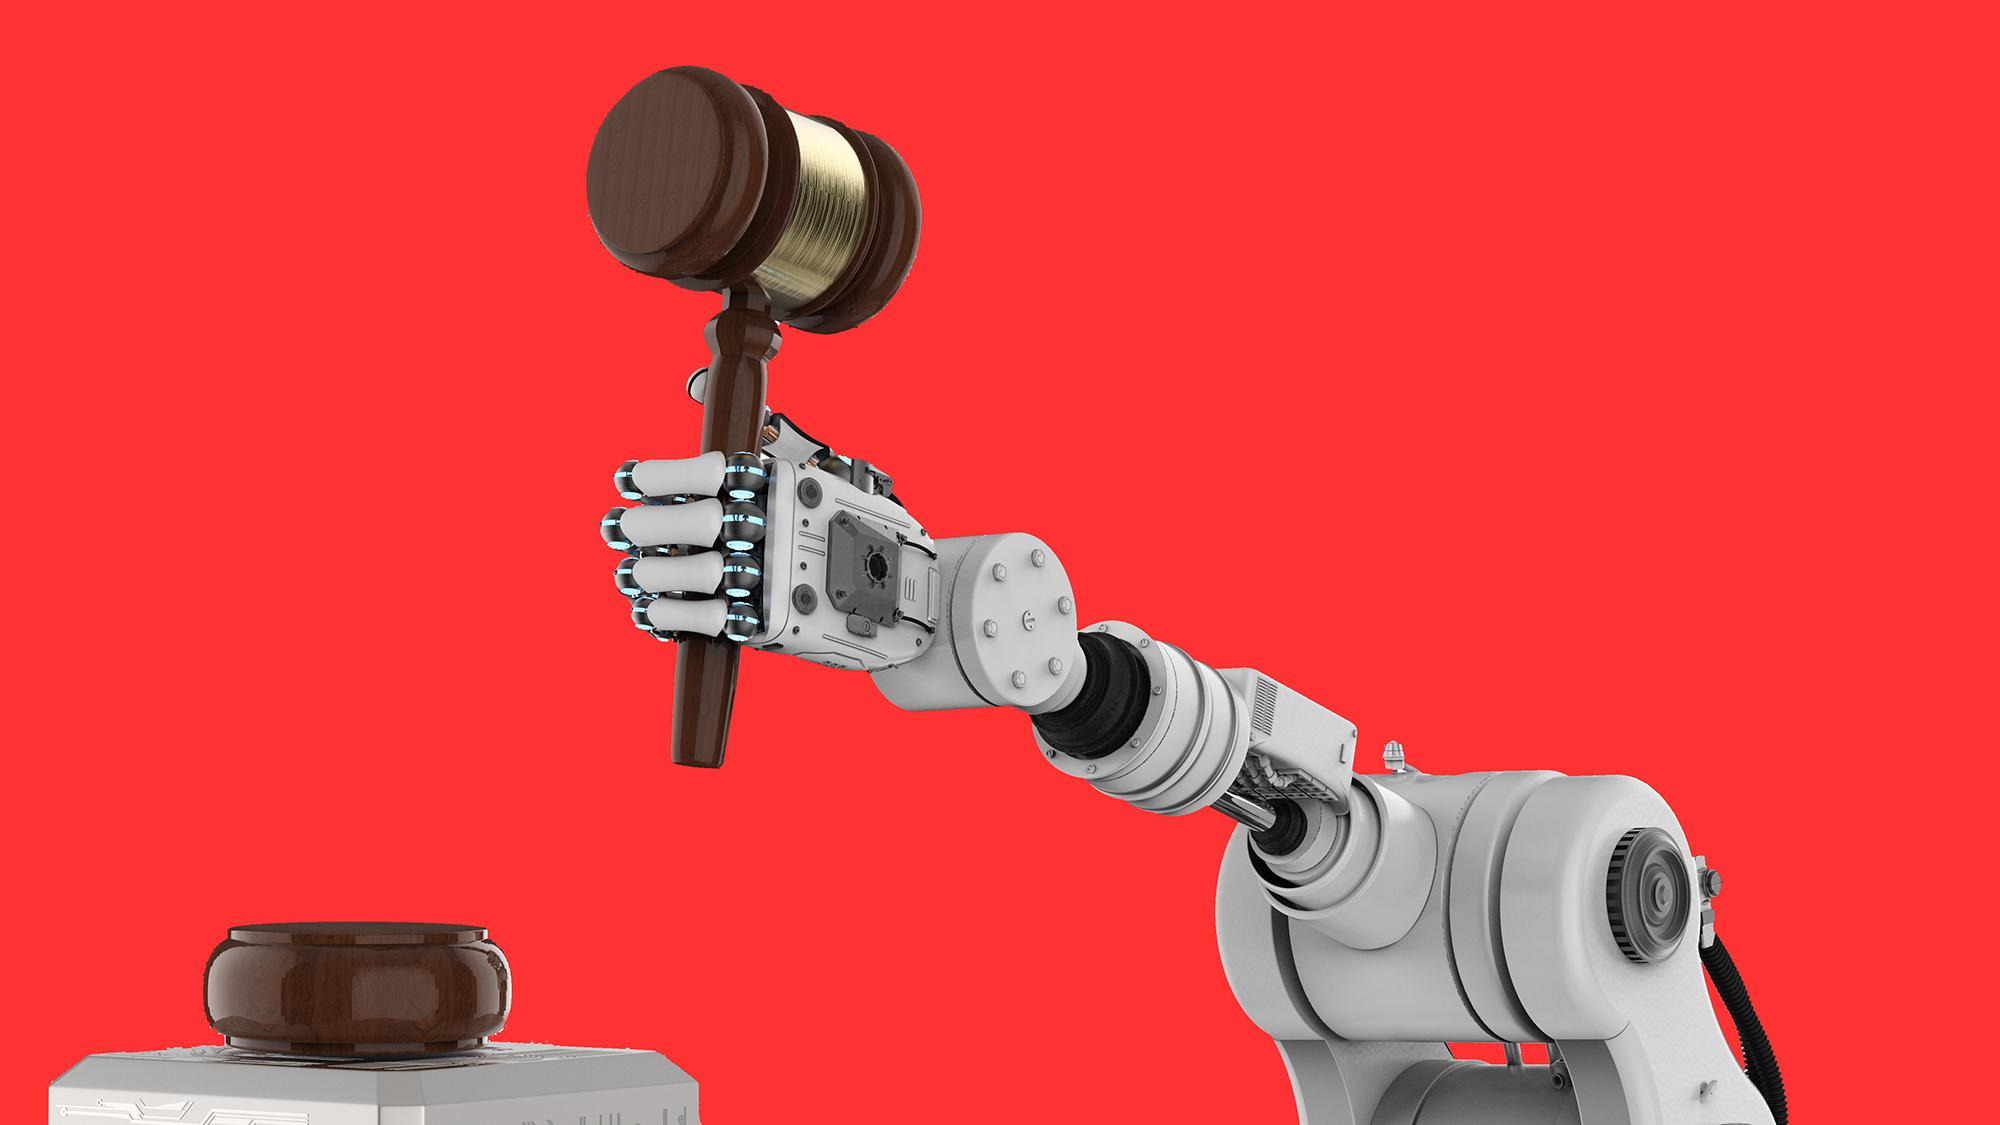 Robots Need Bias Awareness Training, Too